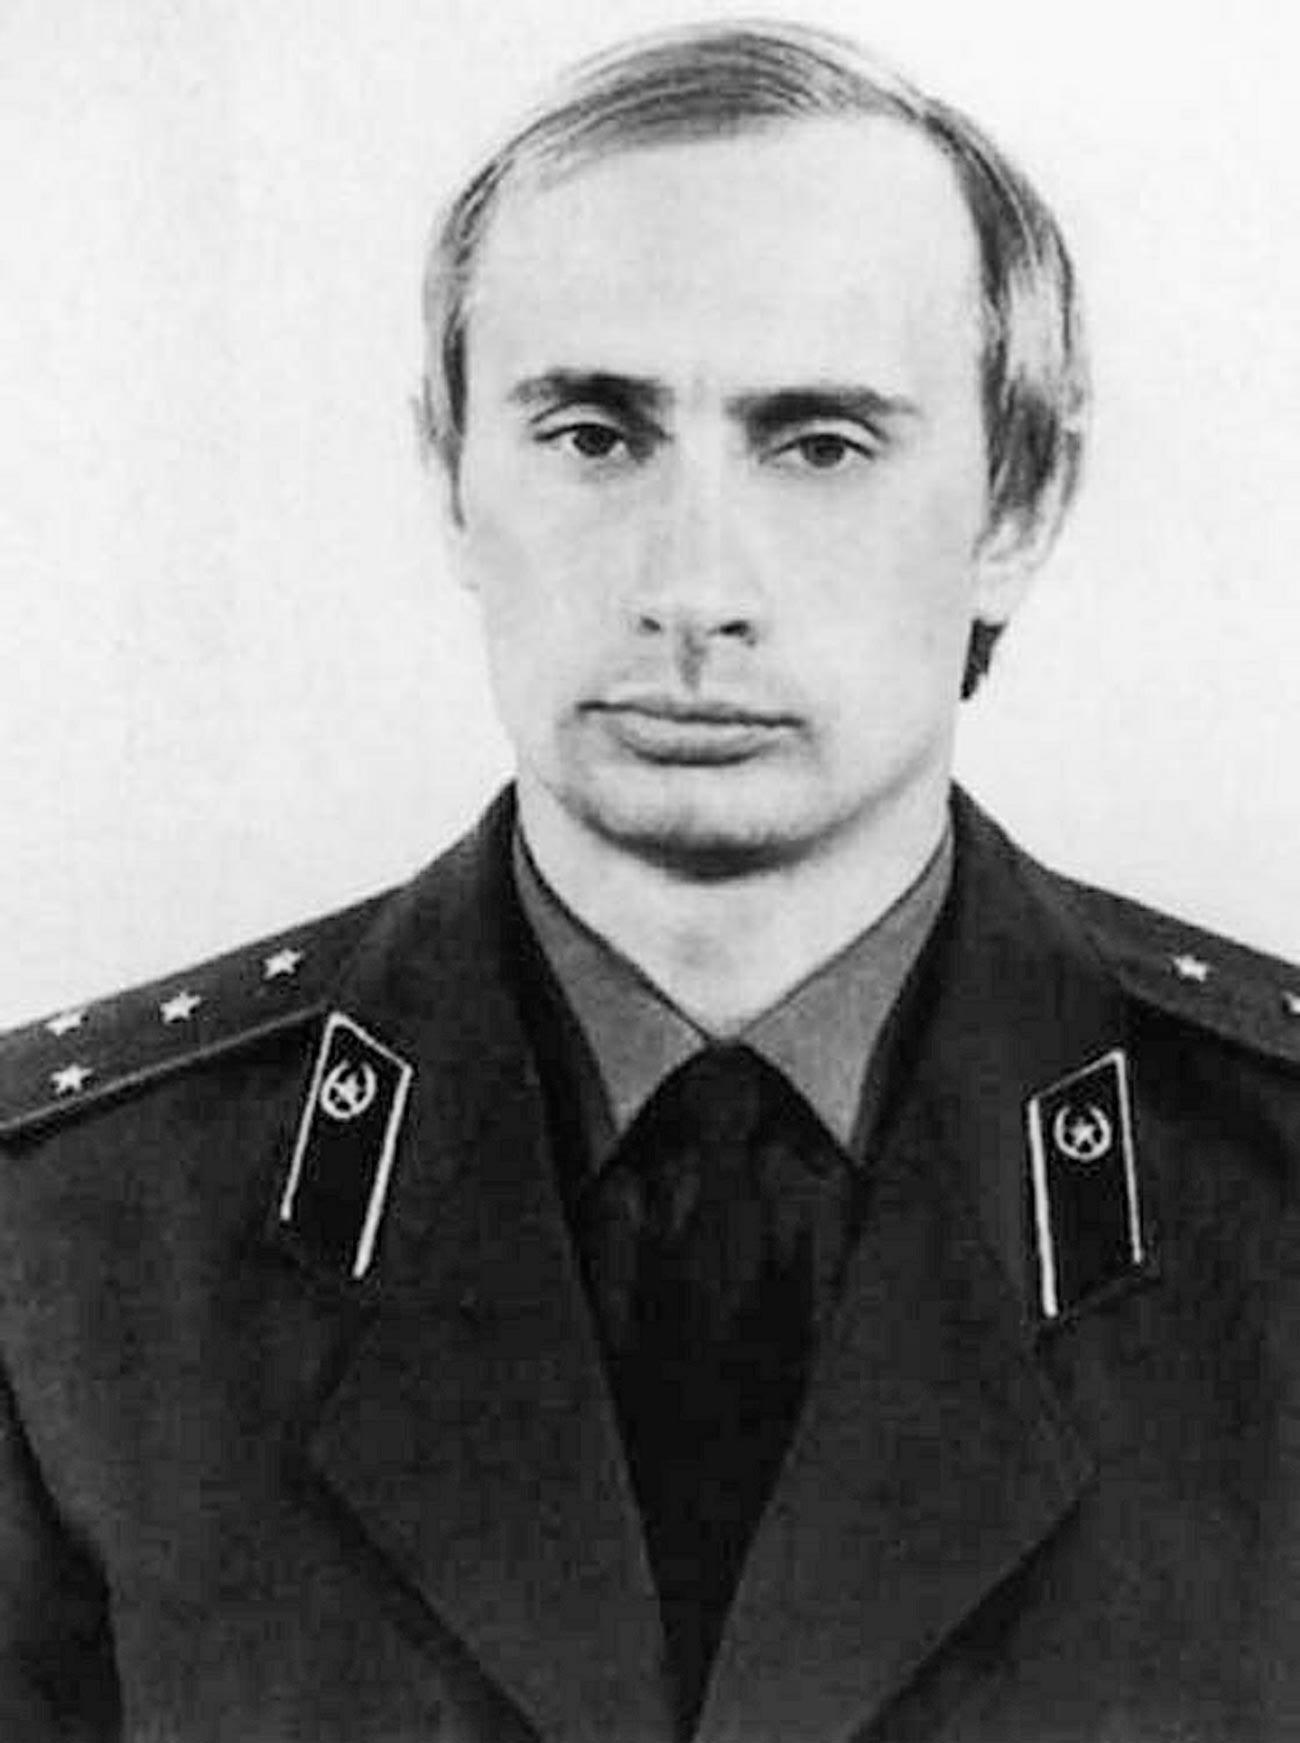 Младиот Владимир Путин во униформа на КГБ